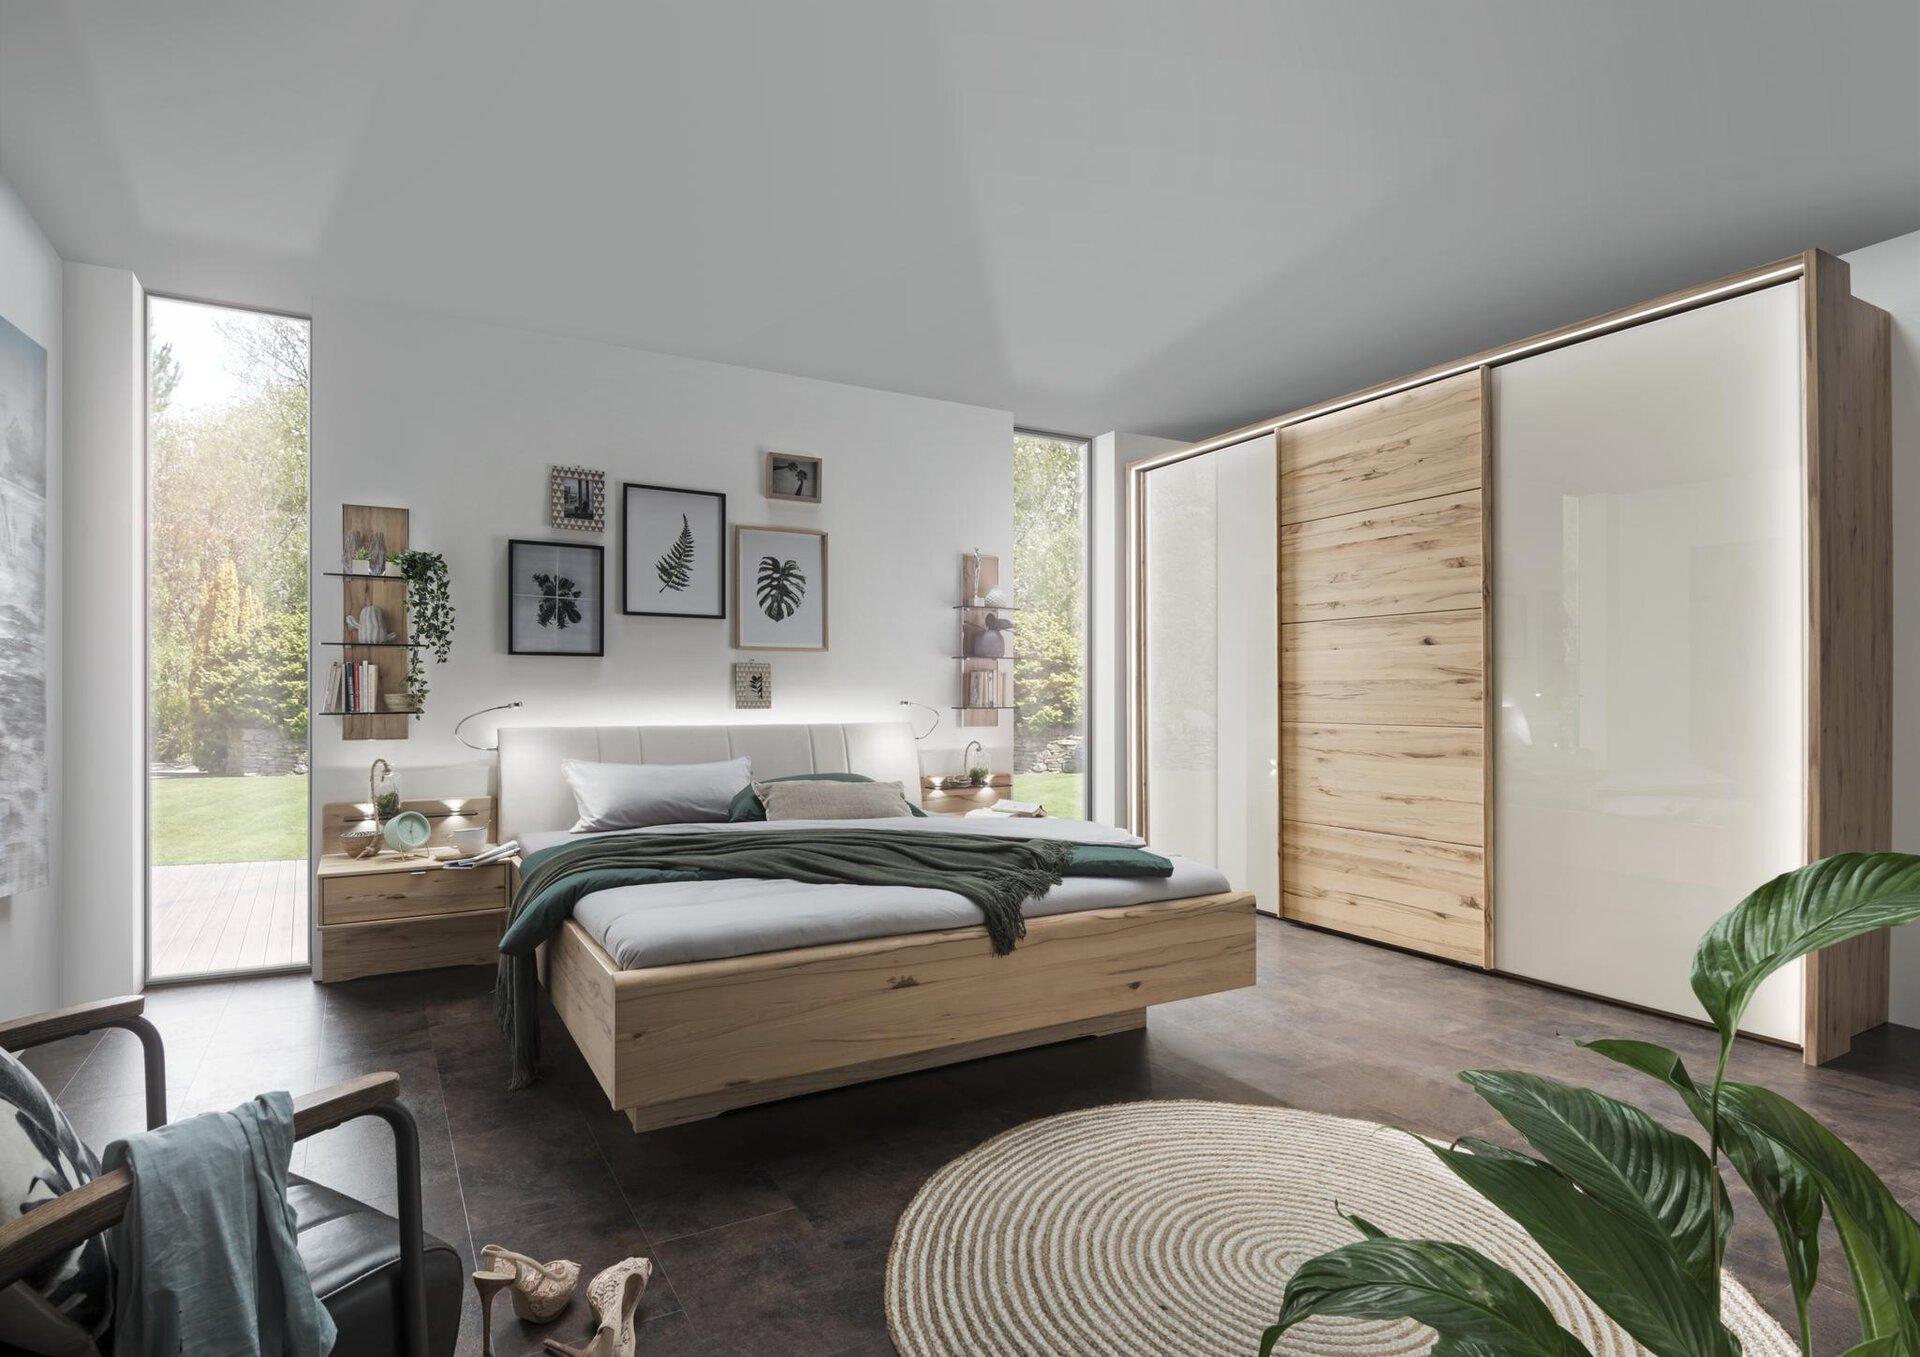 Schlafzimmer ARREZZO MONDO Holzwerkstoff mehrfarbig 67 x 217 x 300 cm